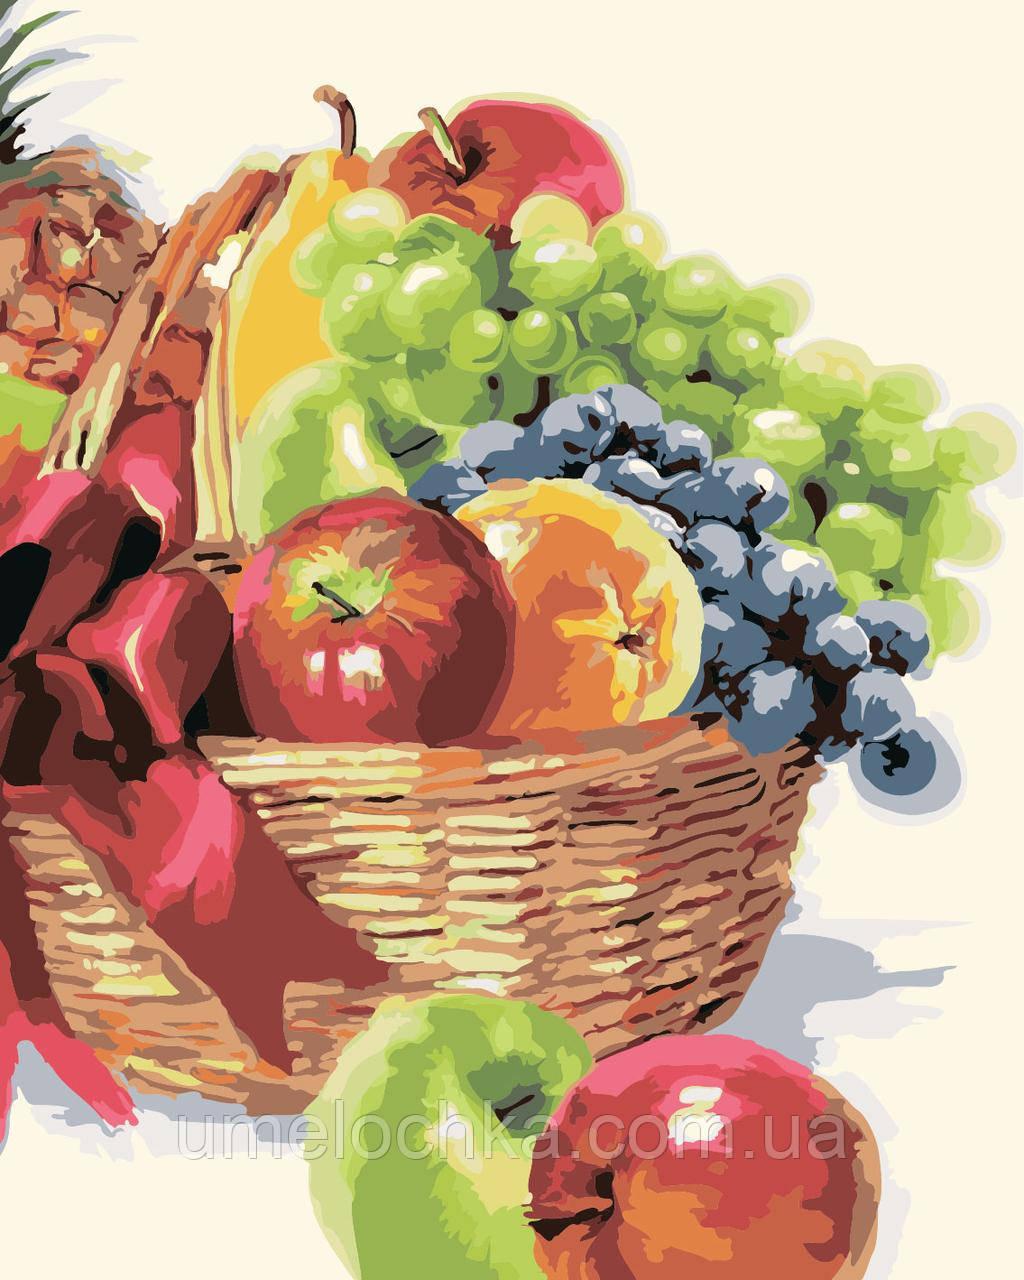 Картина по номерам Идейка Корзинка фруктов Худ Макнейл Ричард (KH2910) 40 х 50 см